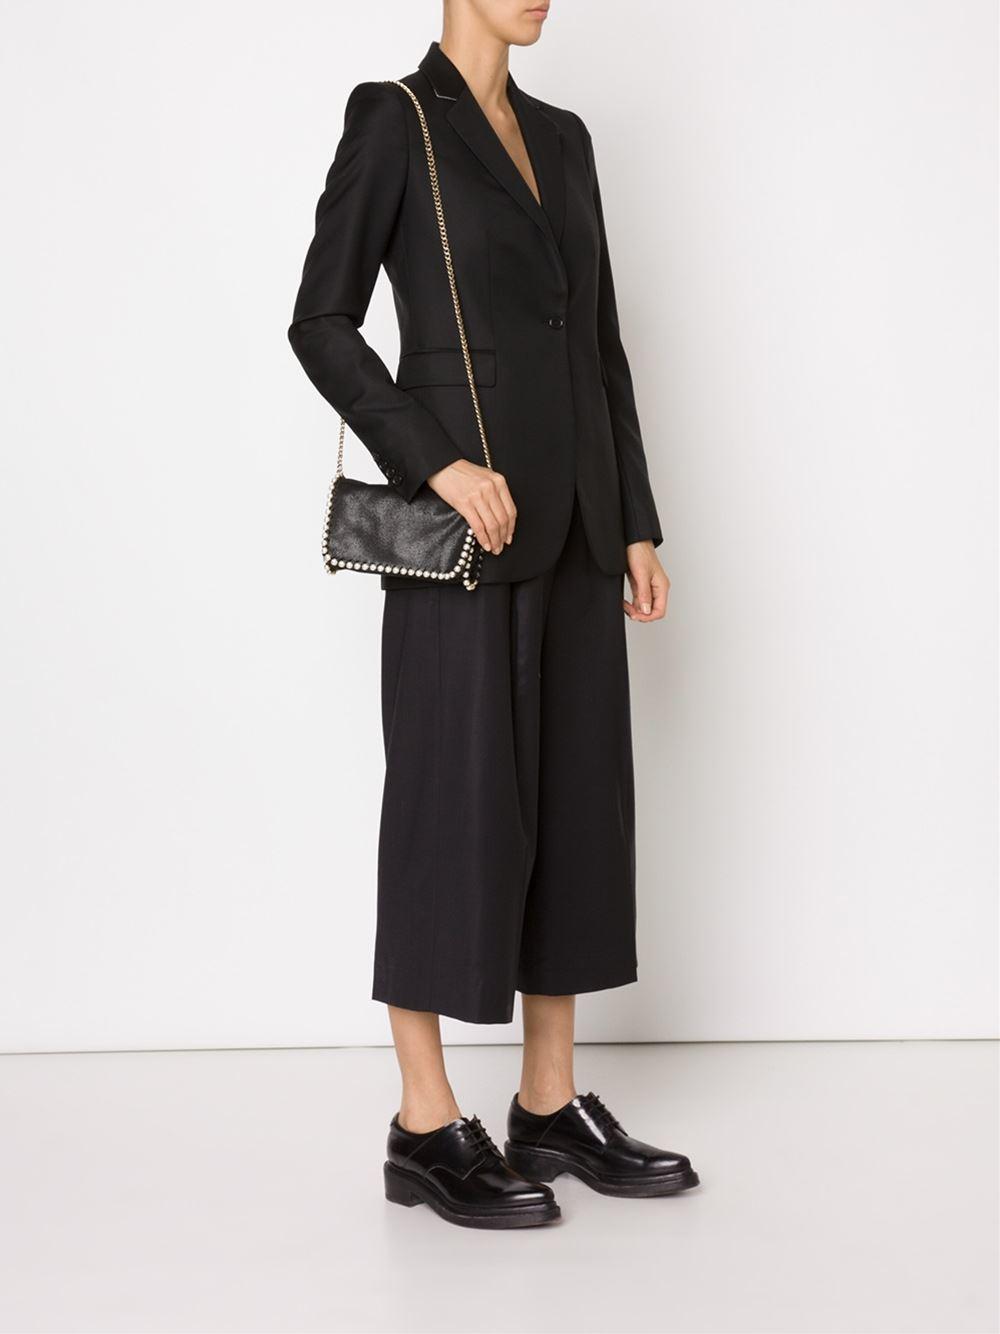 stella mccartney 39 falabella 39 crossbody bag in black lyst. Black Bedroom Furniture Sets. Home Design Ideas